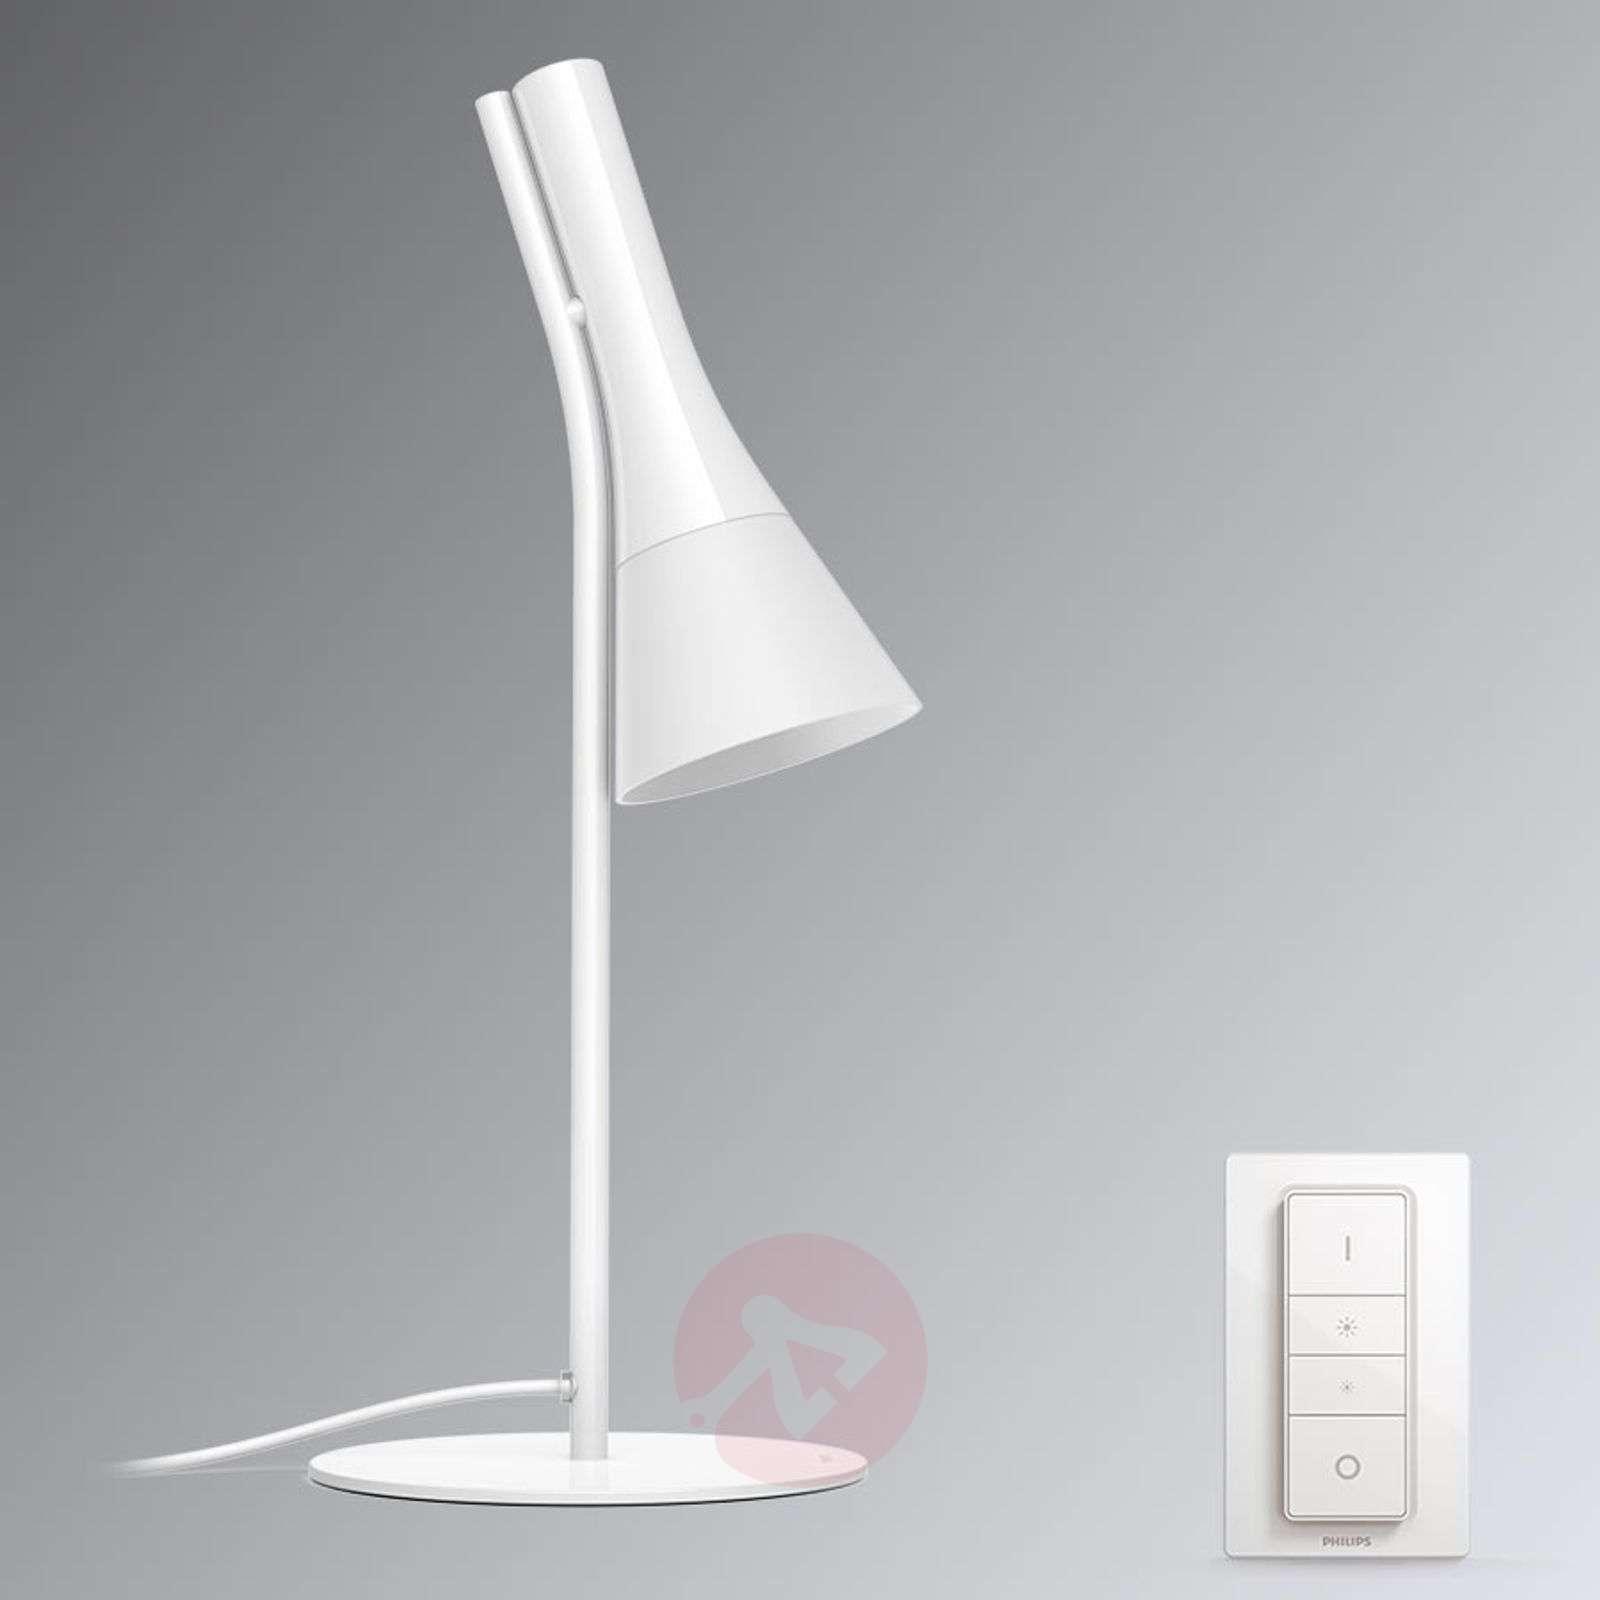 Philips Hue White Ambiance Explore pöytävalaisin-7534063-01